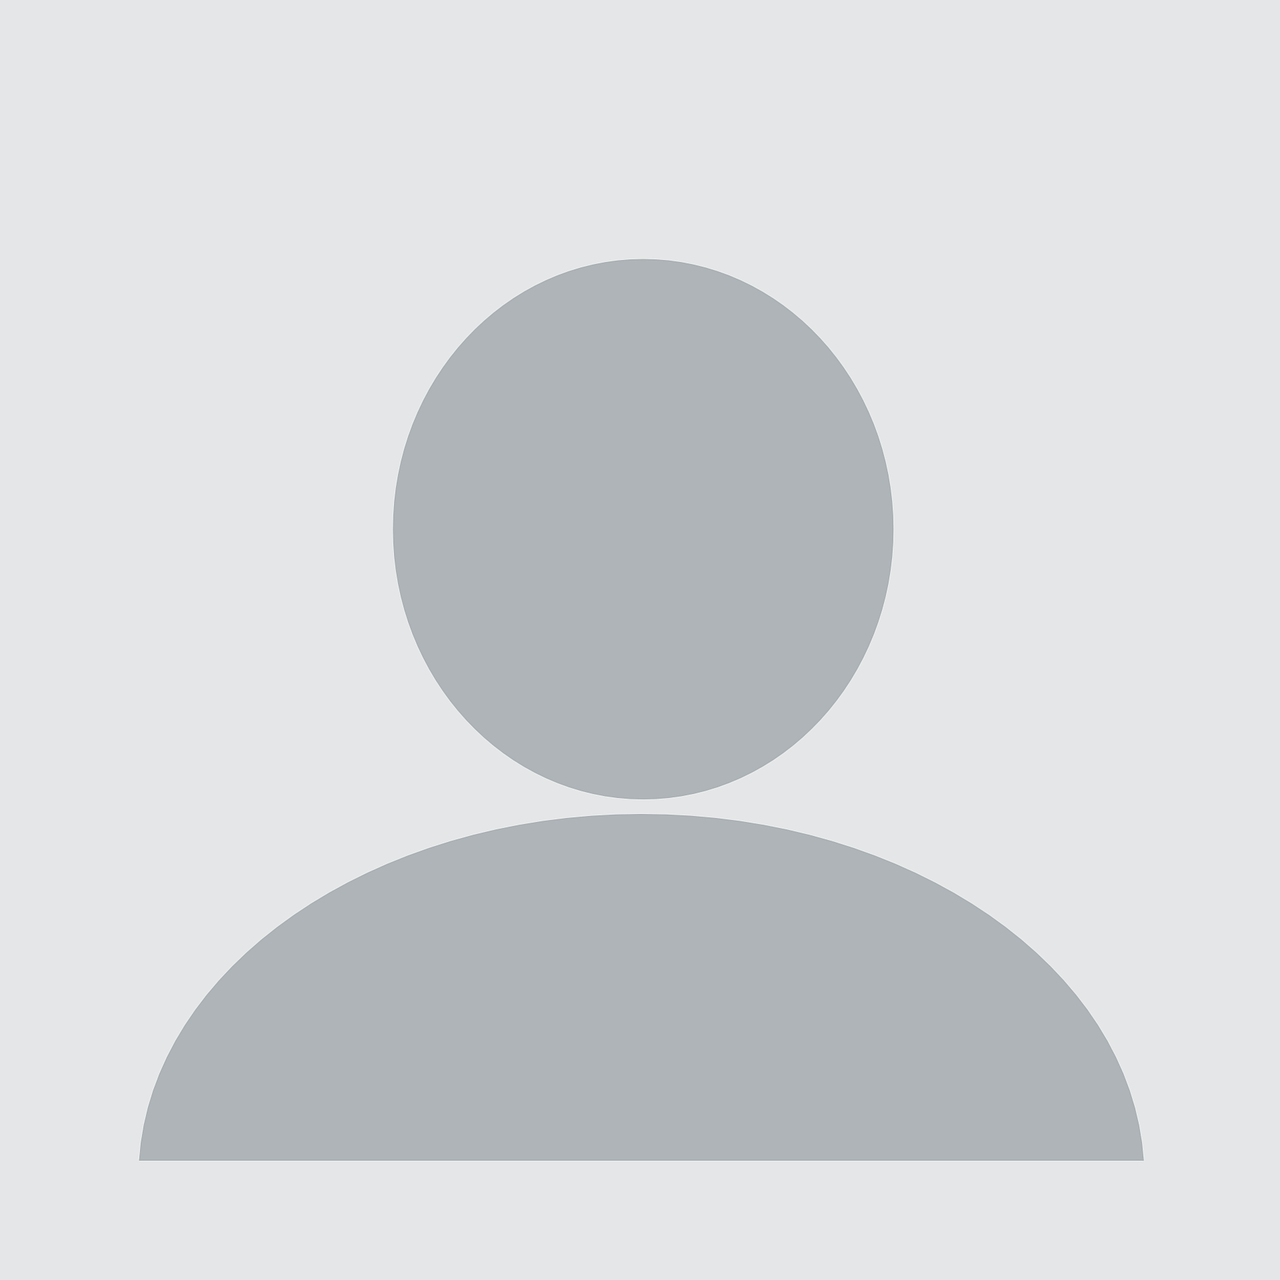 blank profile picture, mystery man, avatar-973460.jpg